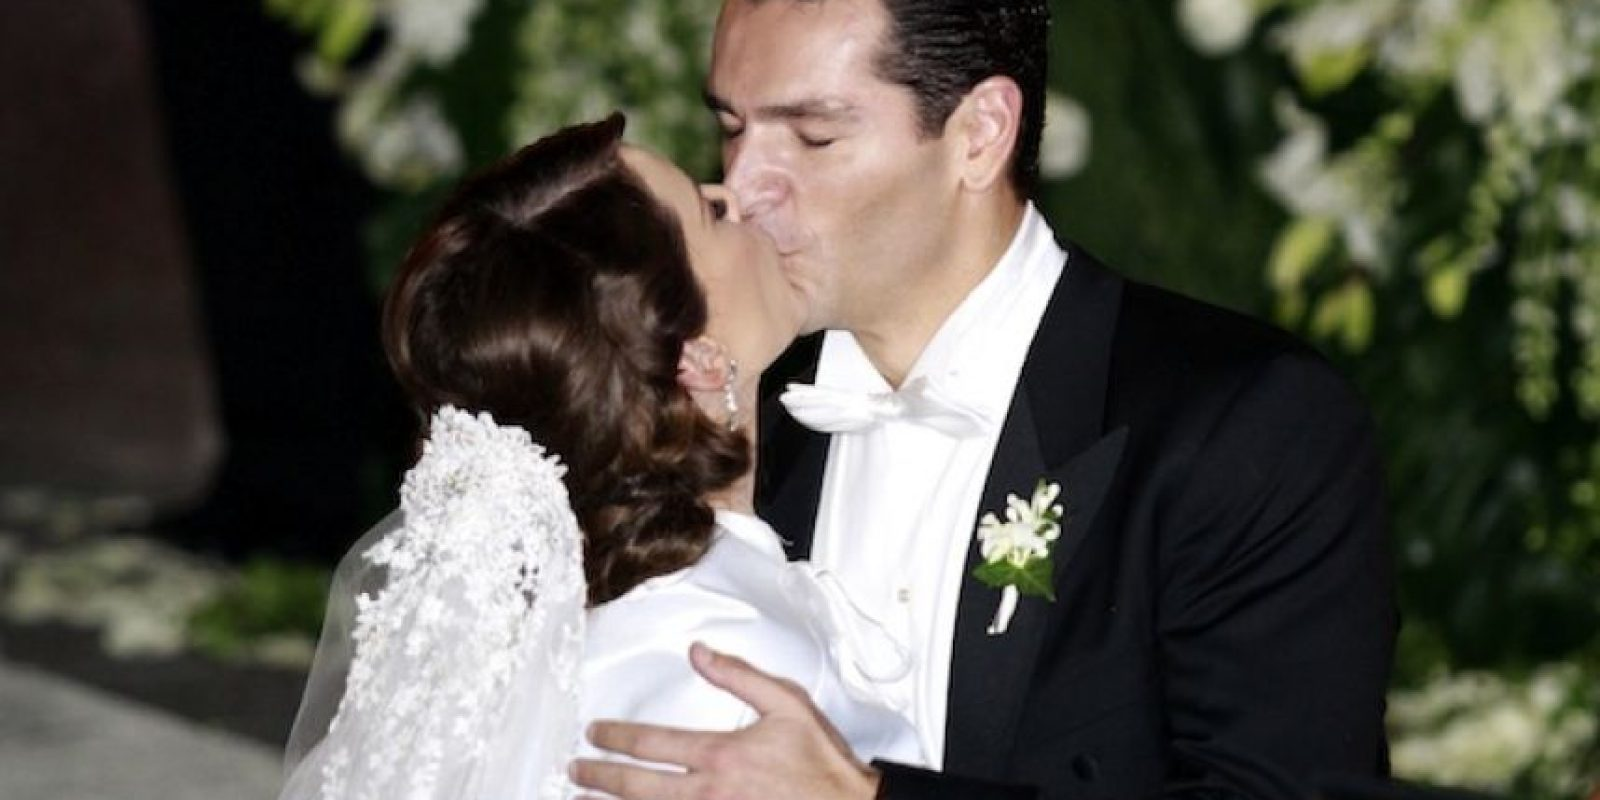 Fotos de la boda de jakeline bracamontes 88